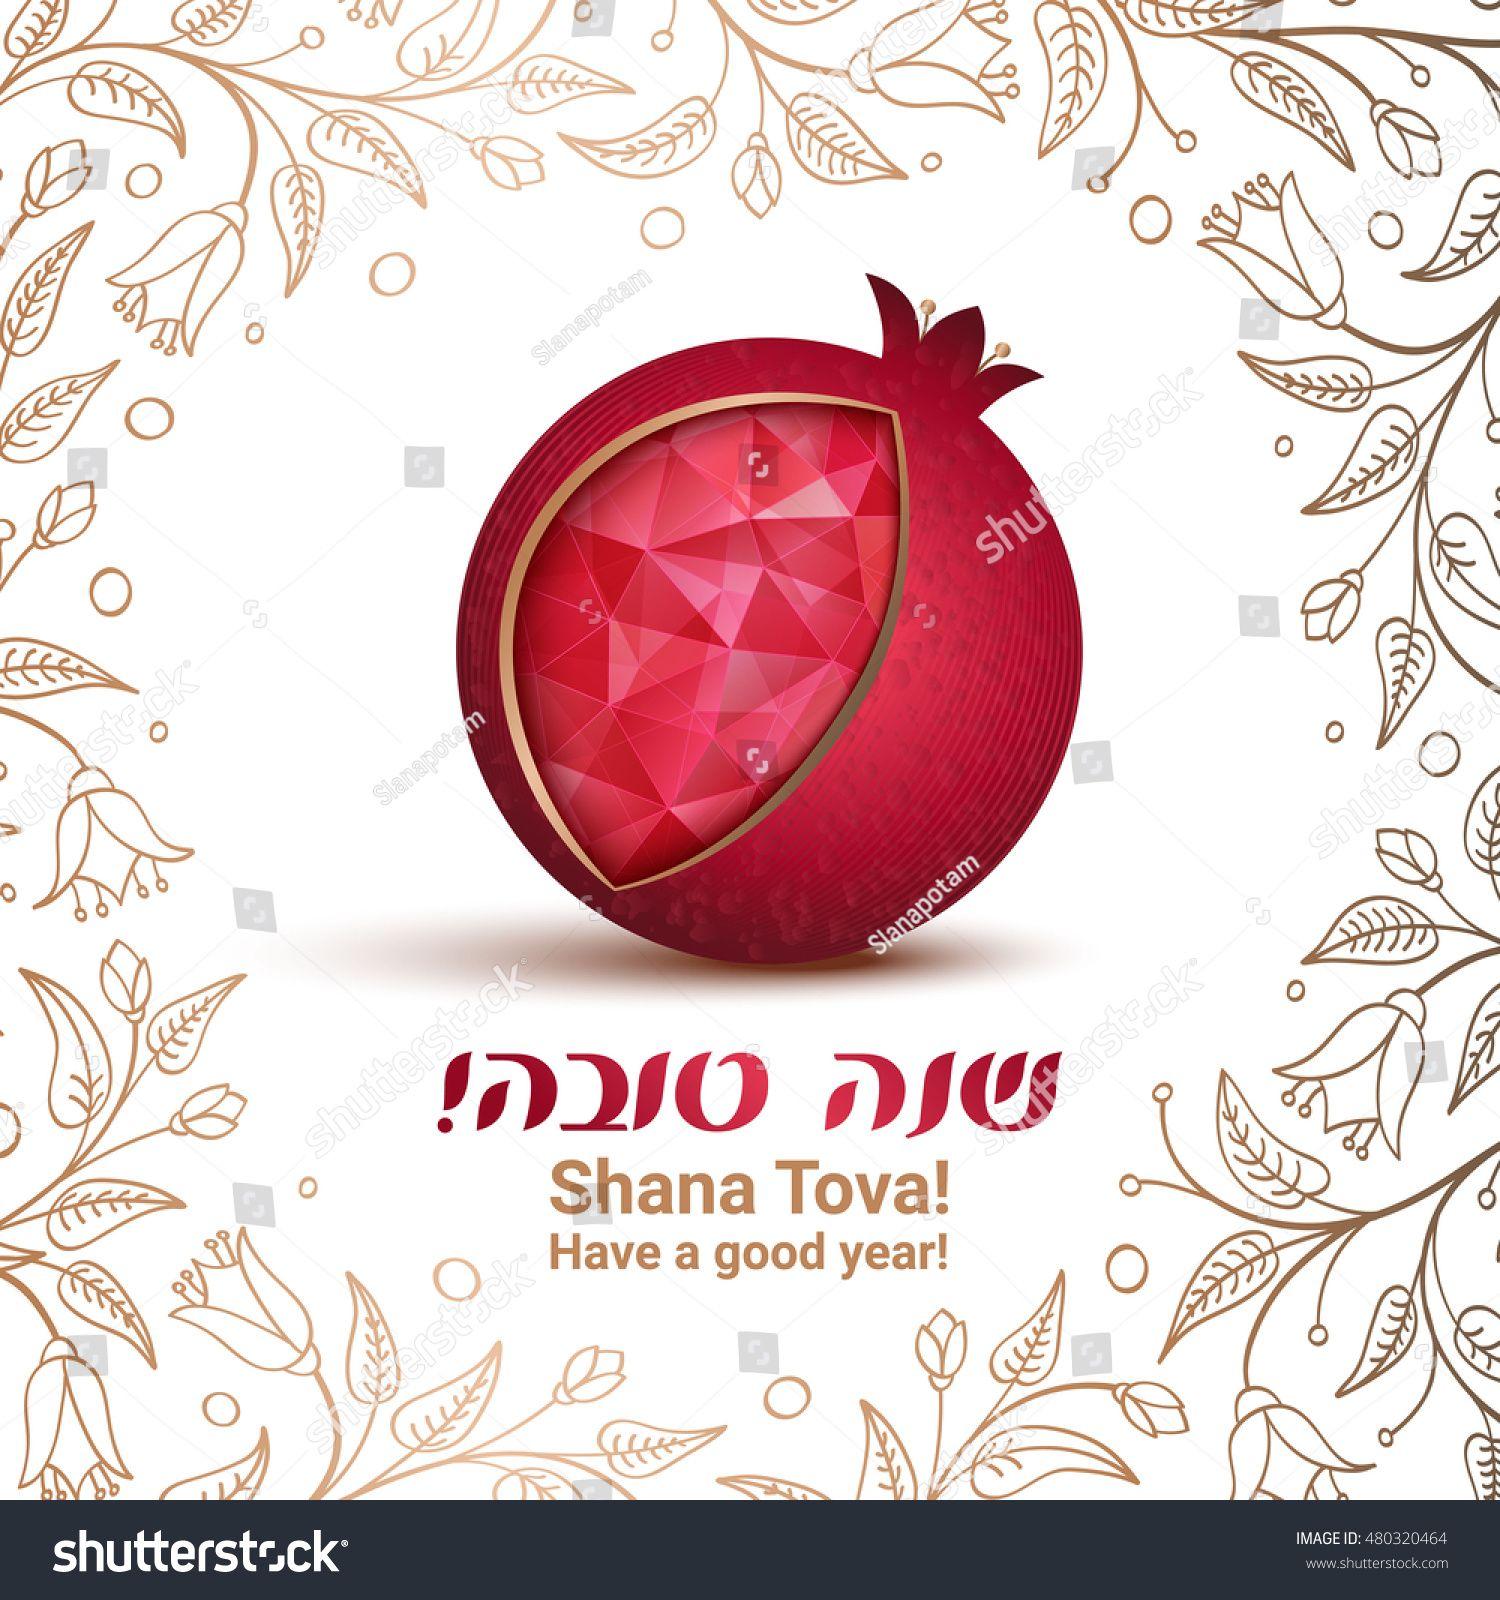 Rosh hashana card Jewish New Year. Greeting text Shana